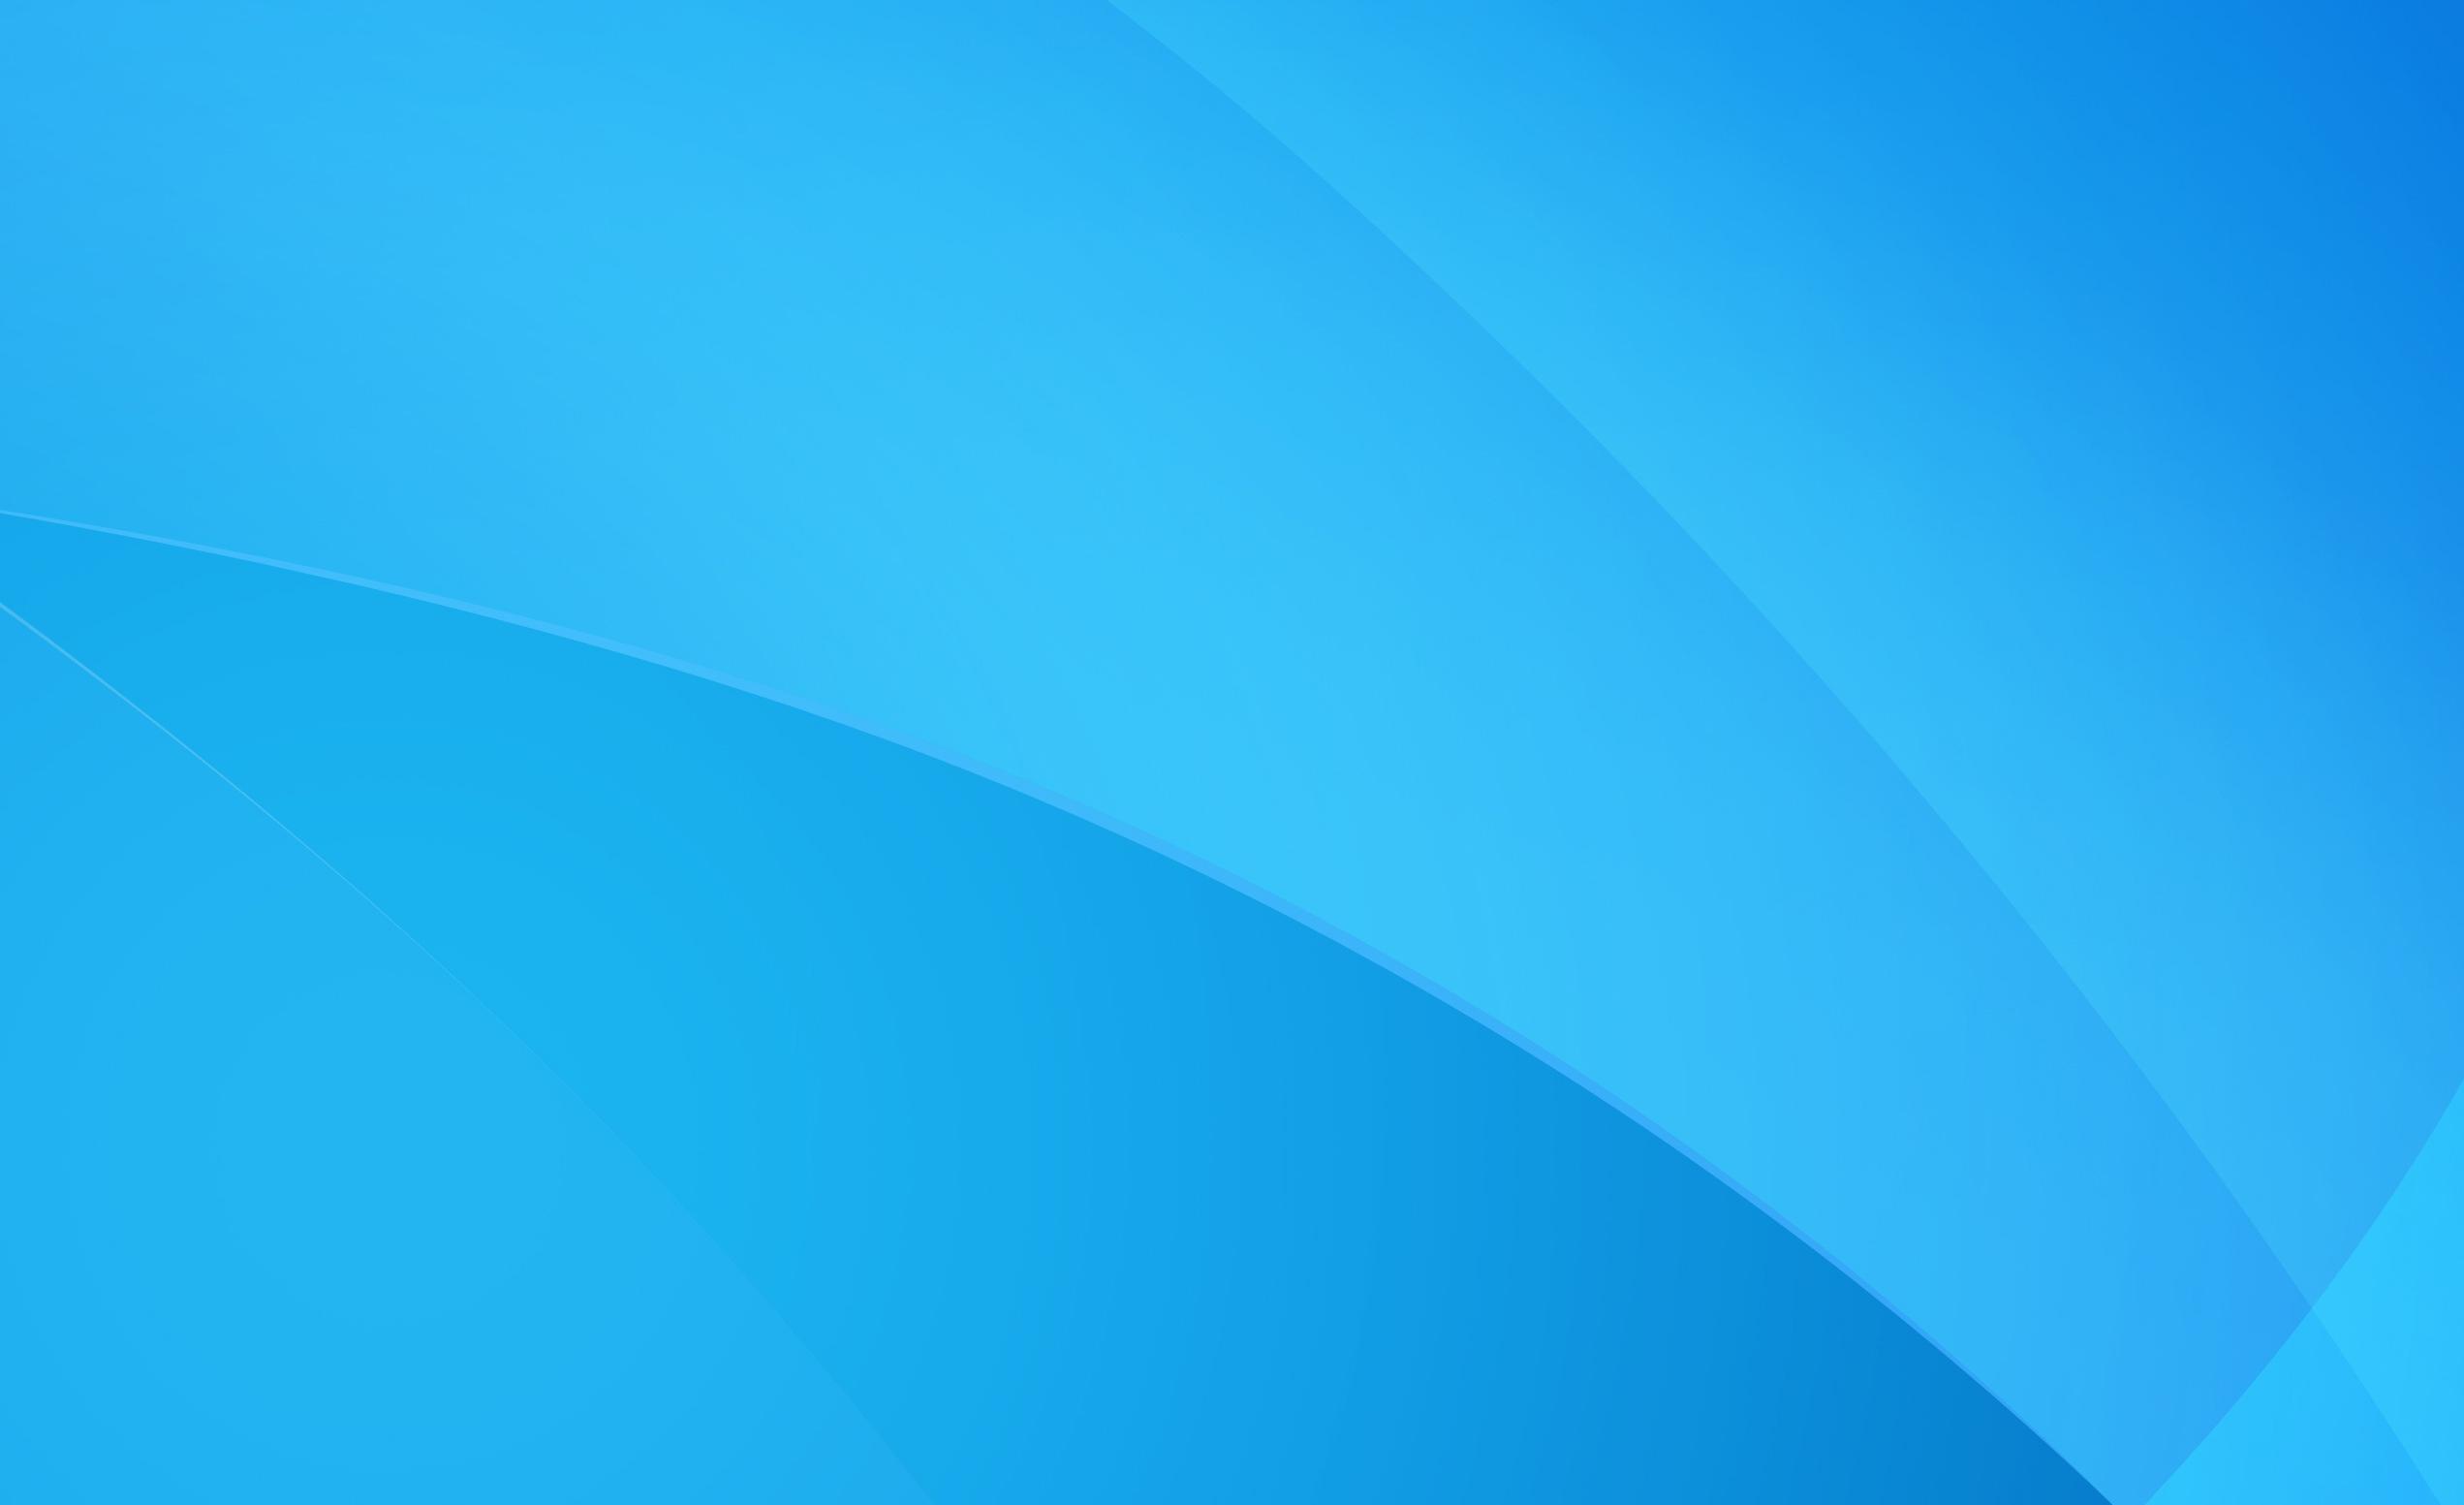 75 Background Image Blue On Wallpapersafari